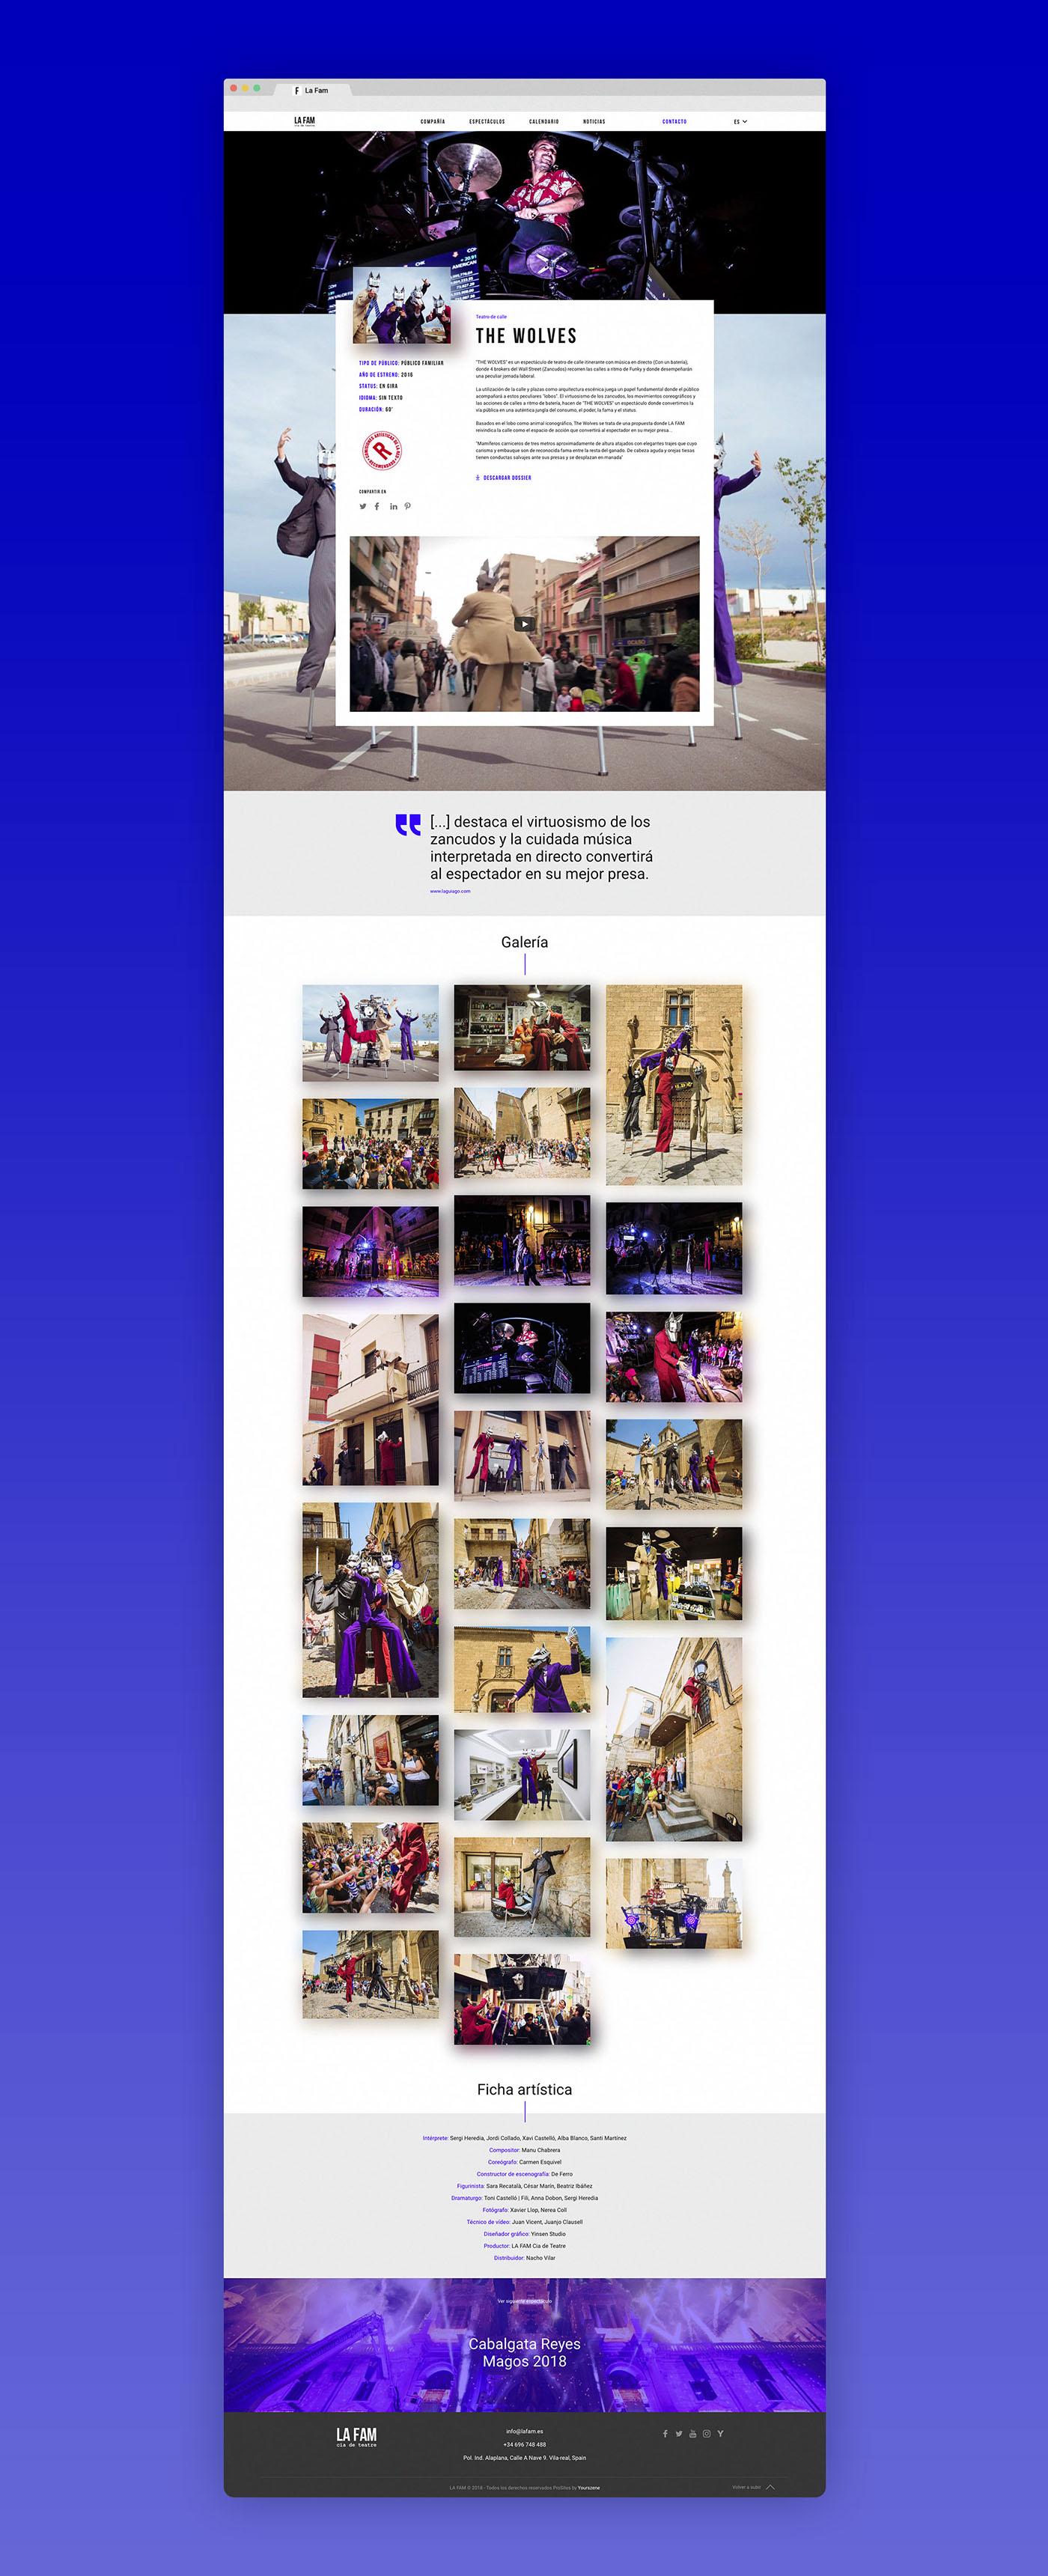 compañia teatro theatre companie teatro Theatre musica music Show espectáculo actor Street